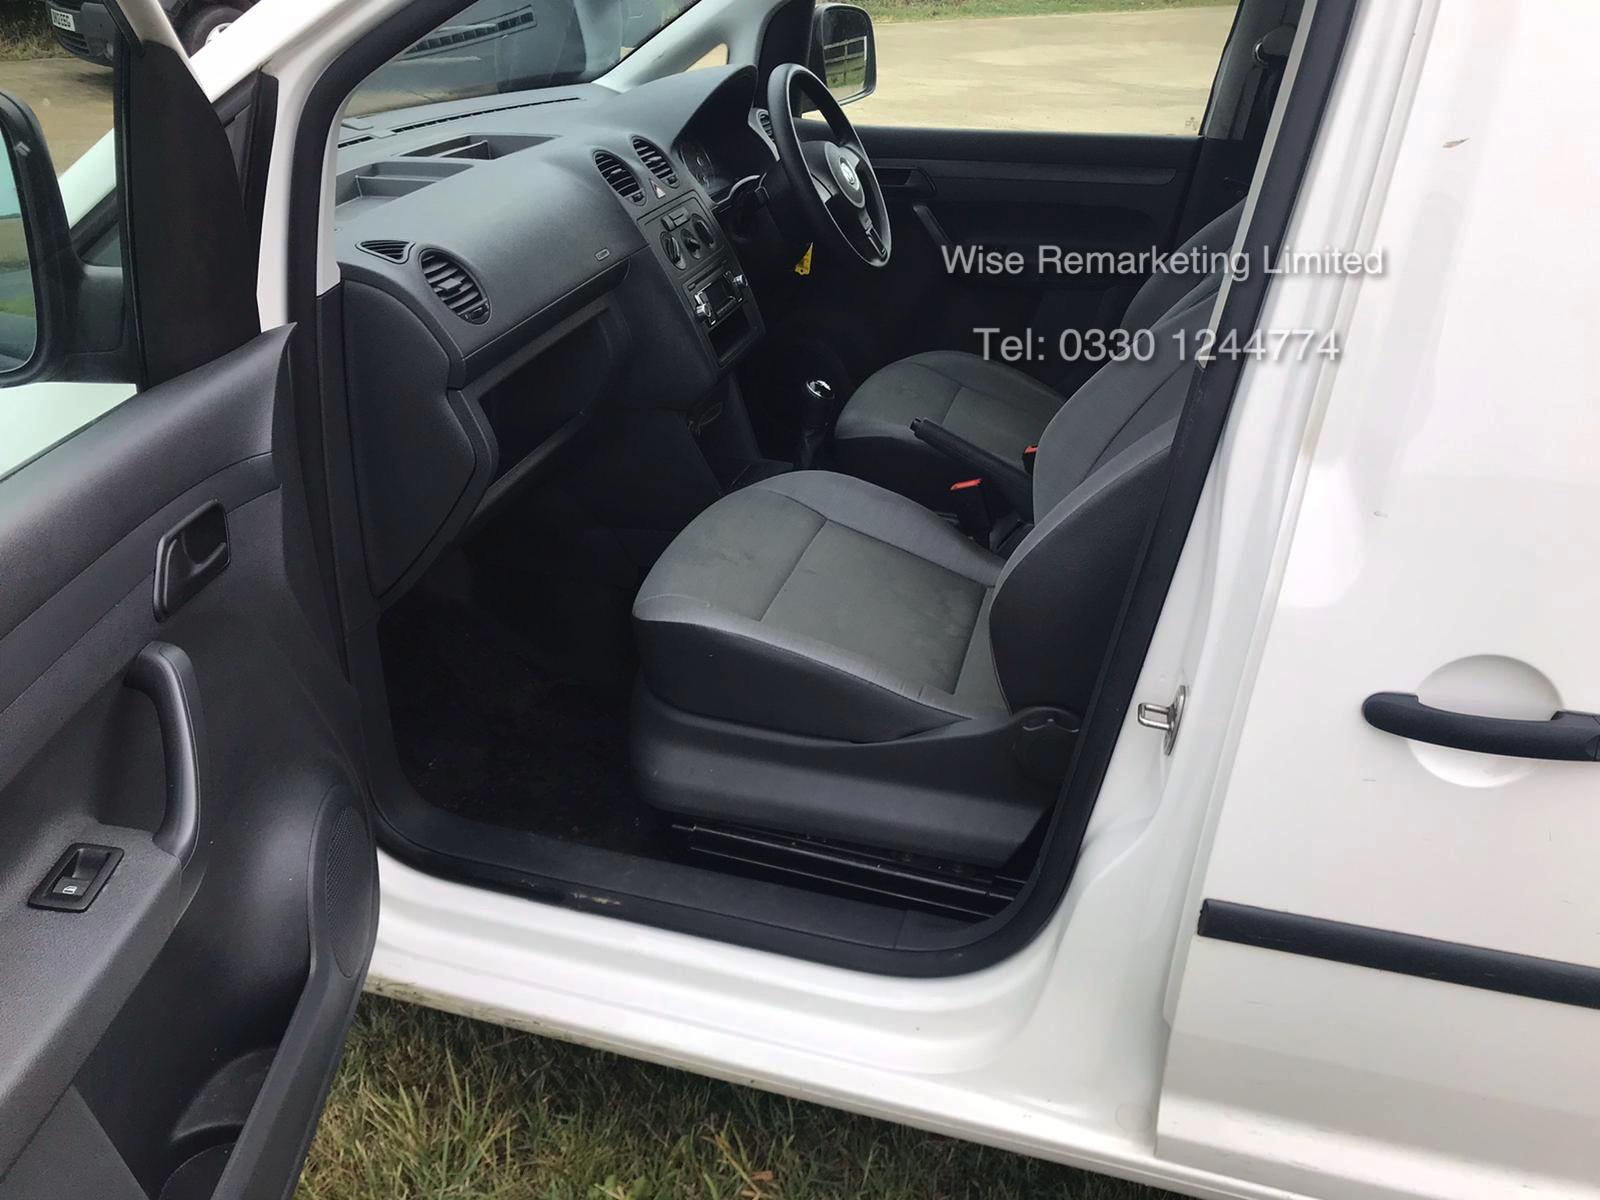 Volkswagen Caddy C20 + Startline 1.6 Tdi - 2014 Model - White - Side Loading Door - Ply Lined - Image 8 of 13